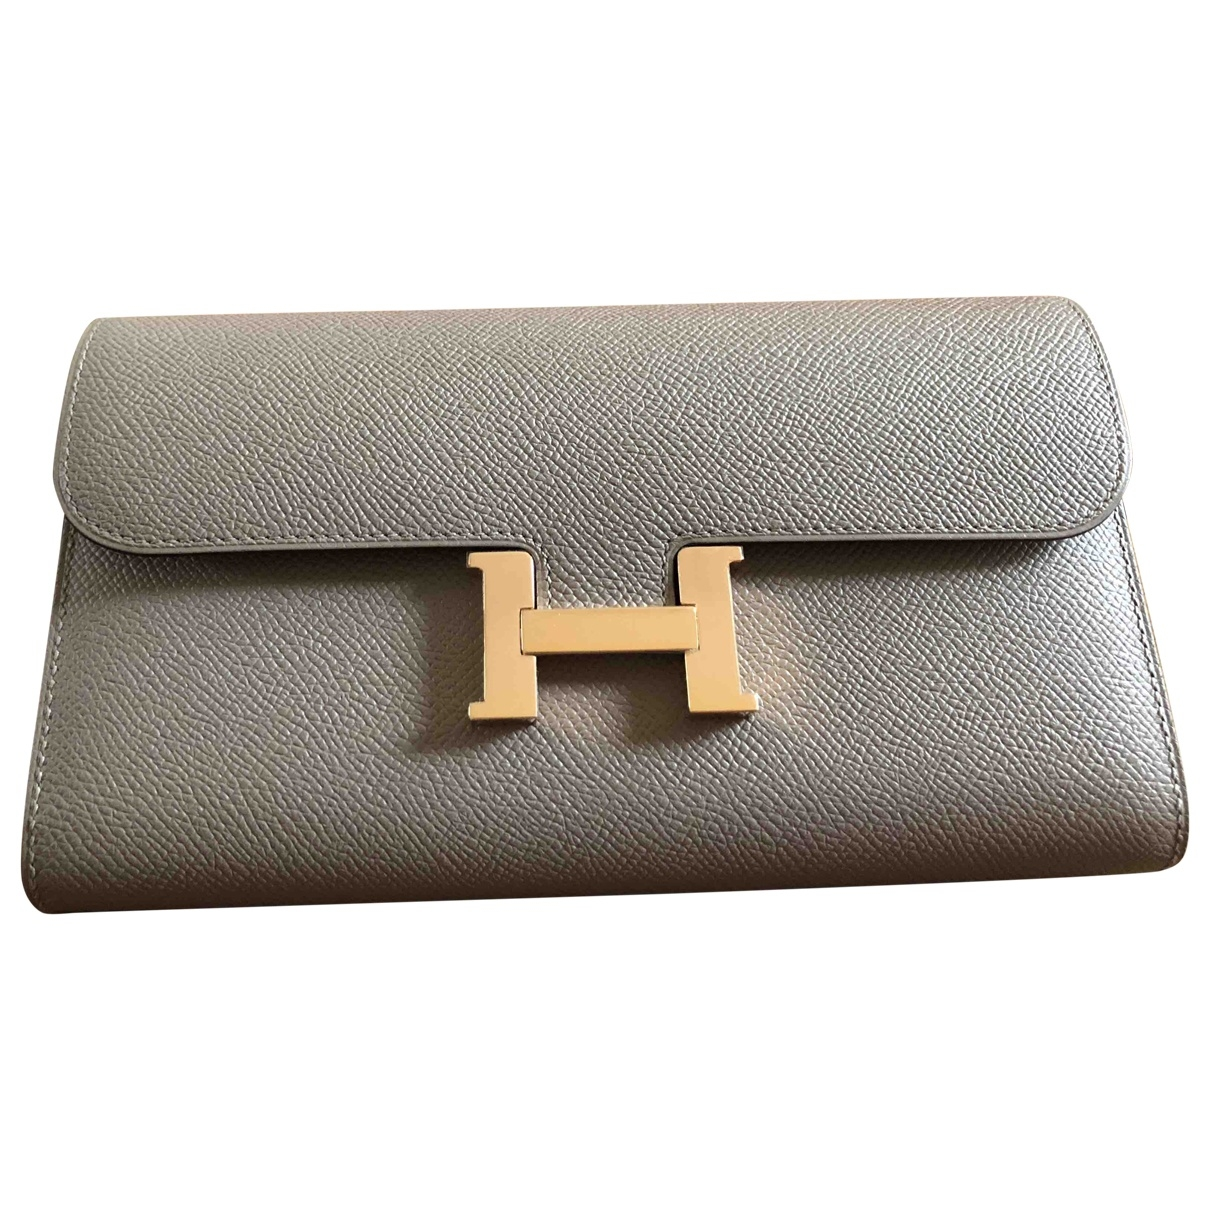 Hermes Constance Portemonnaie in  Grau / Taupe Leder